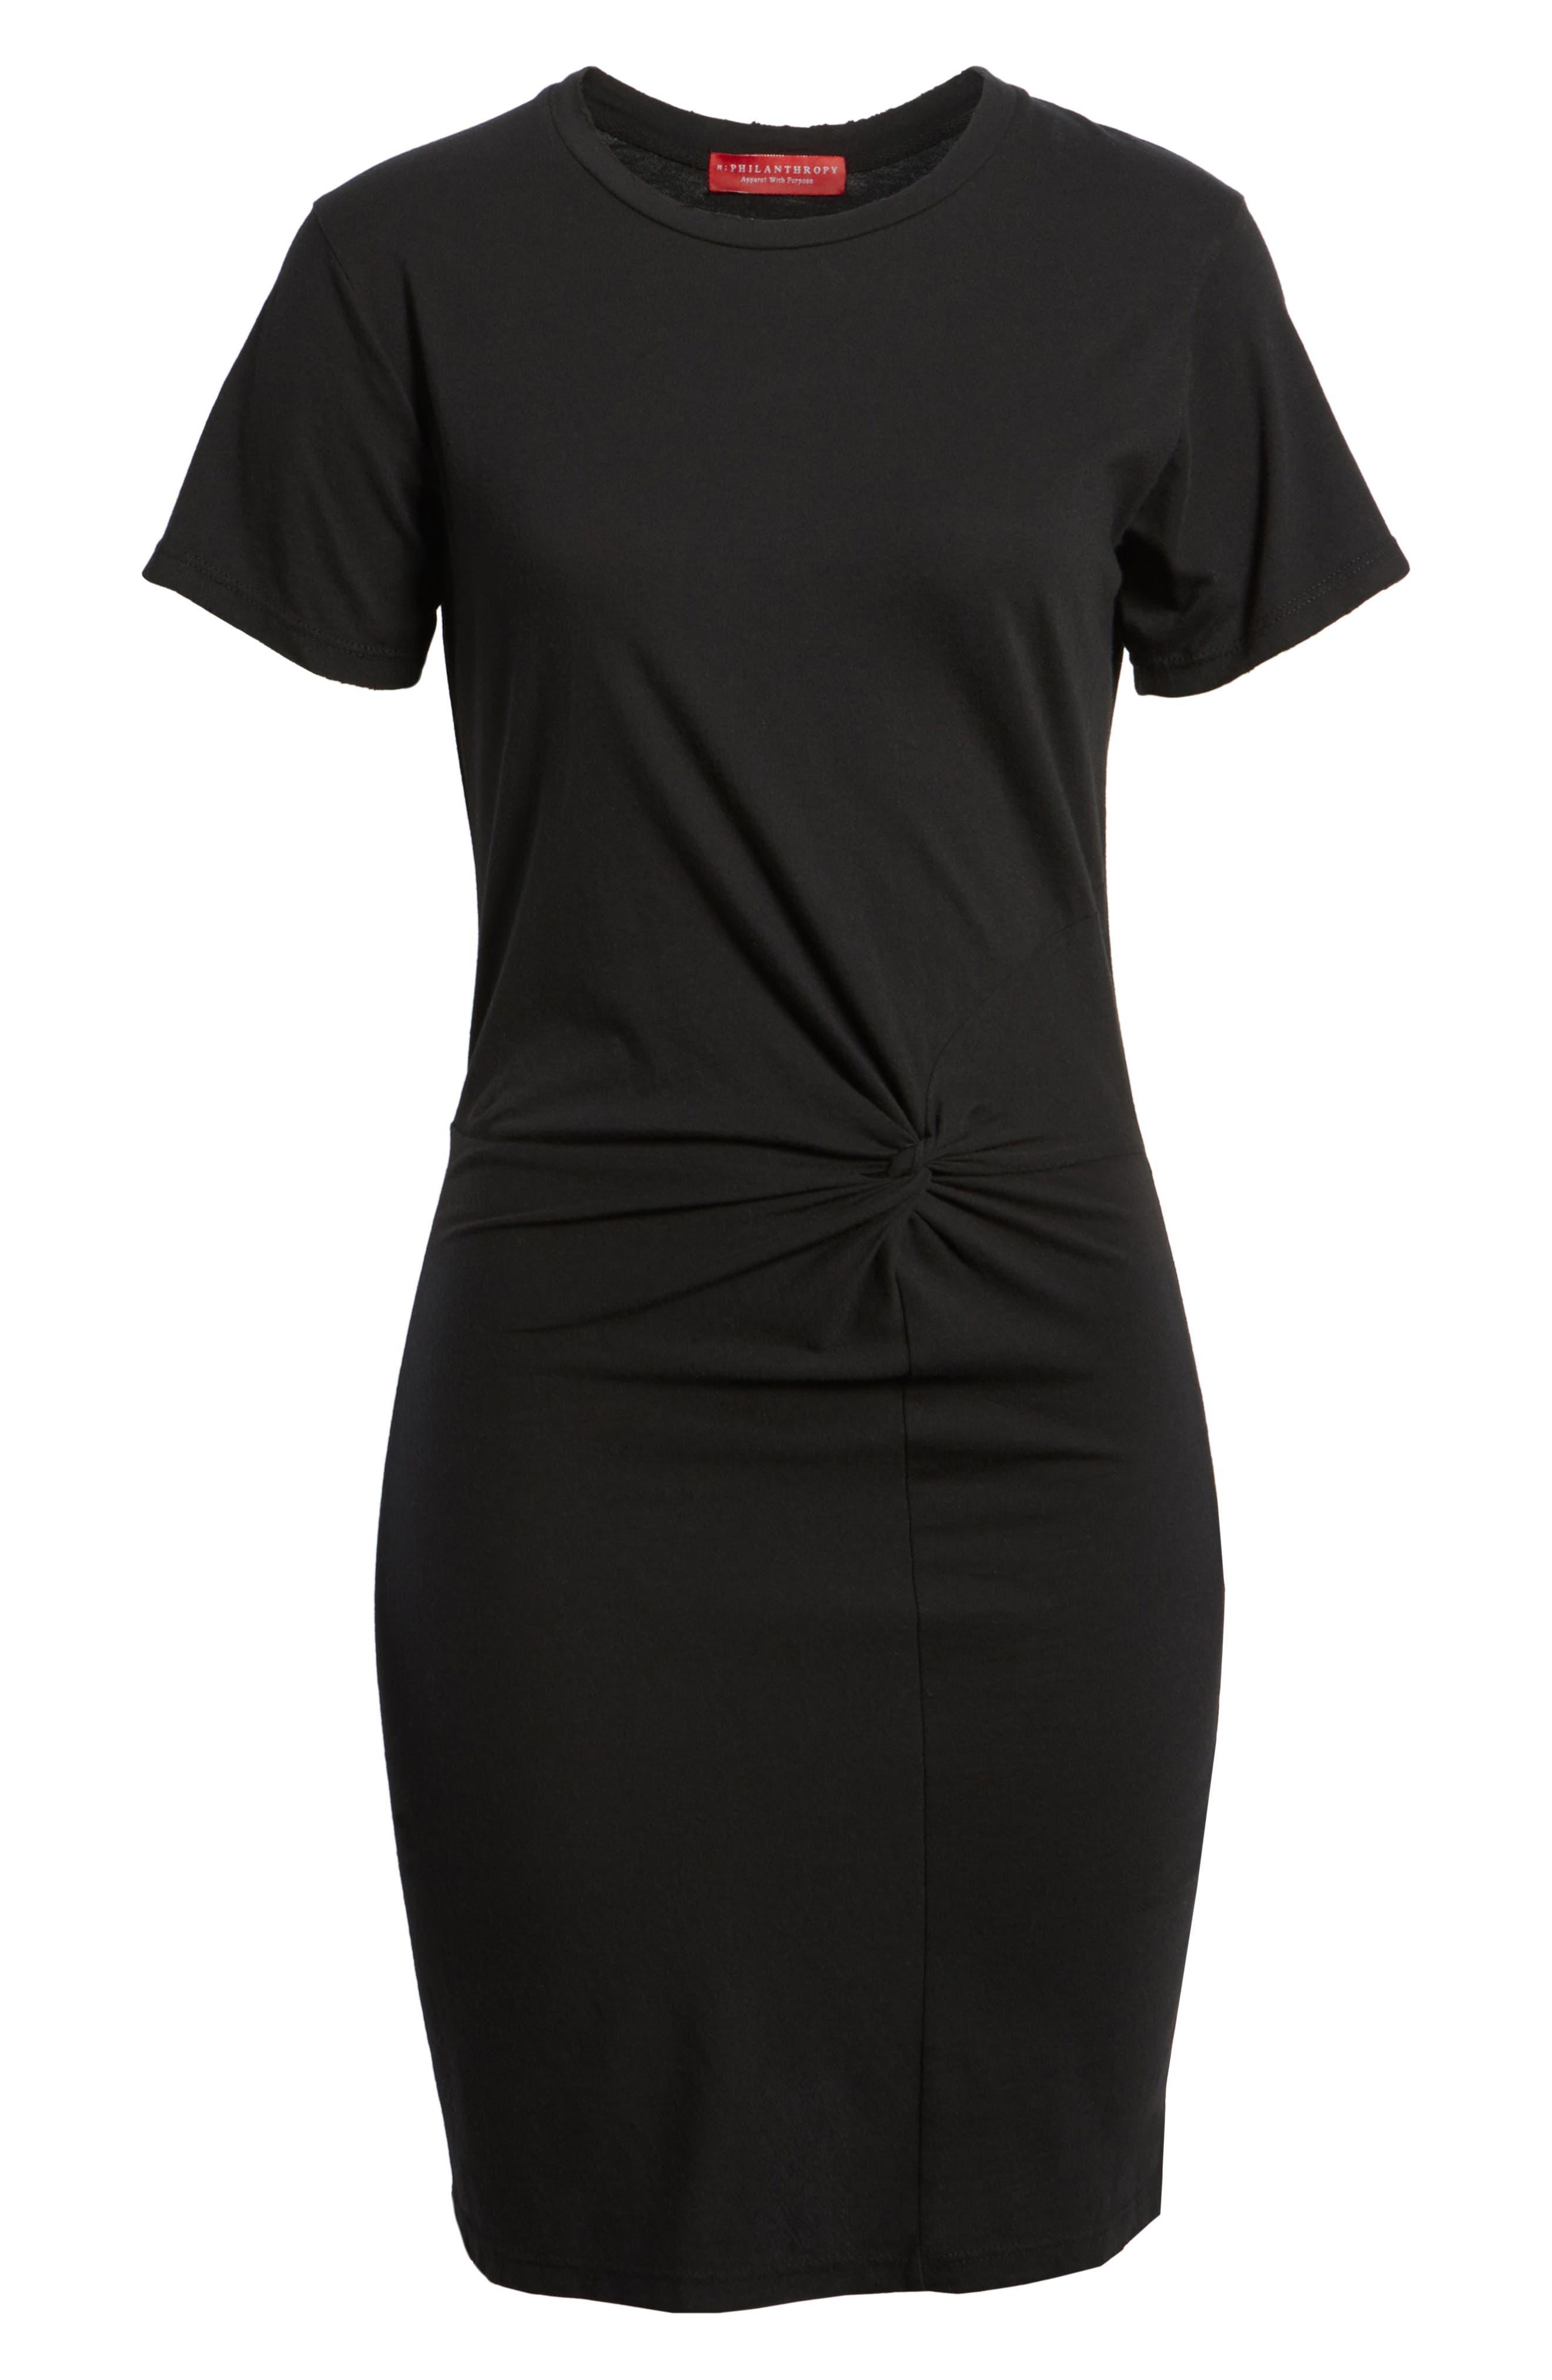 Jazz Knotted T-Shirt Dress,                             Alternate thumbnail 6, color,                             BLACK CAT